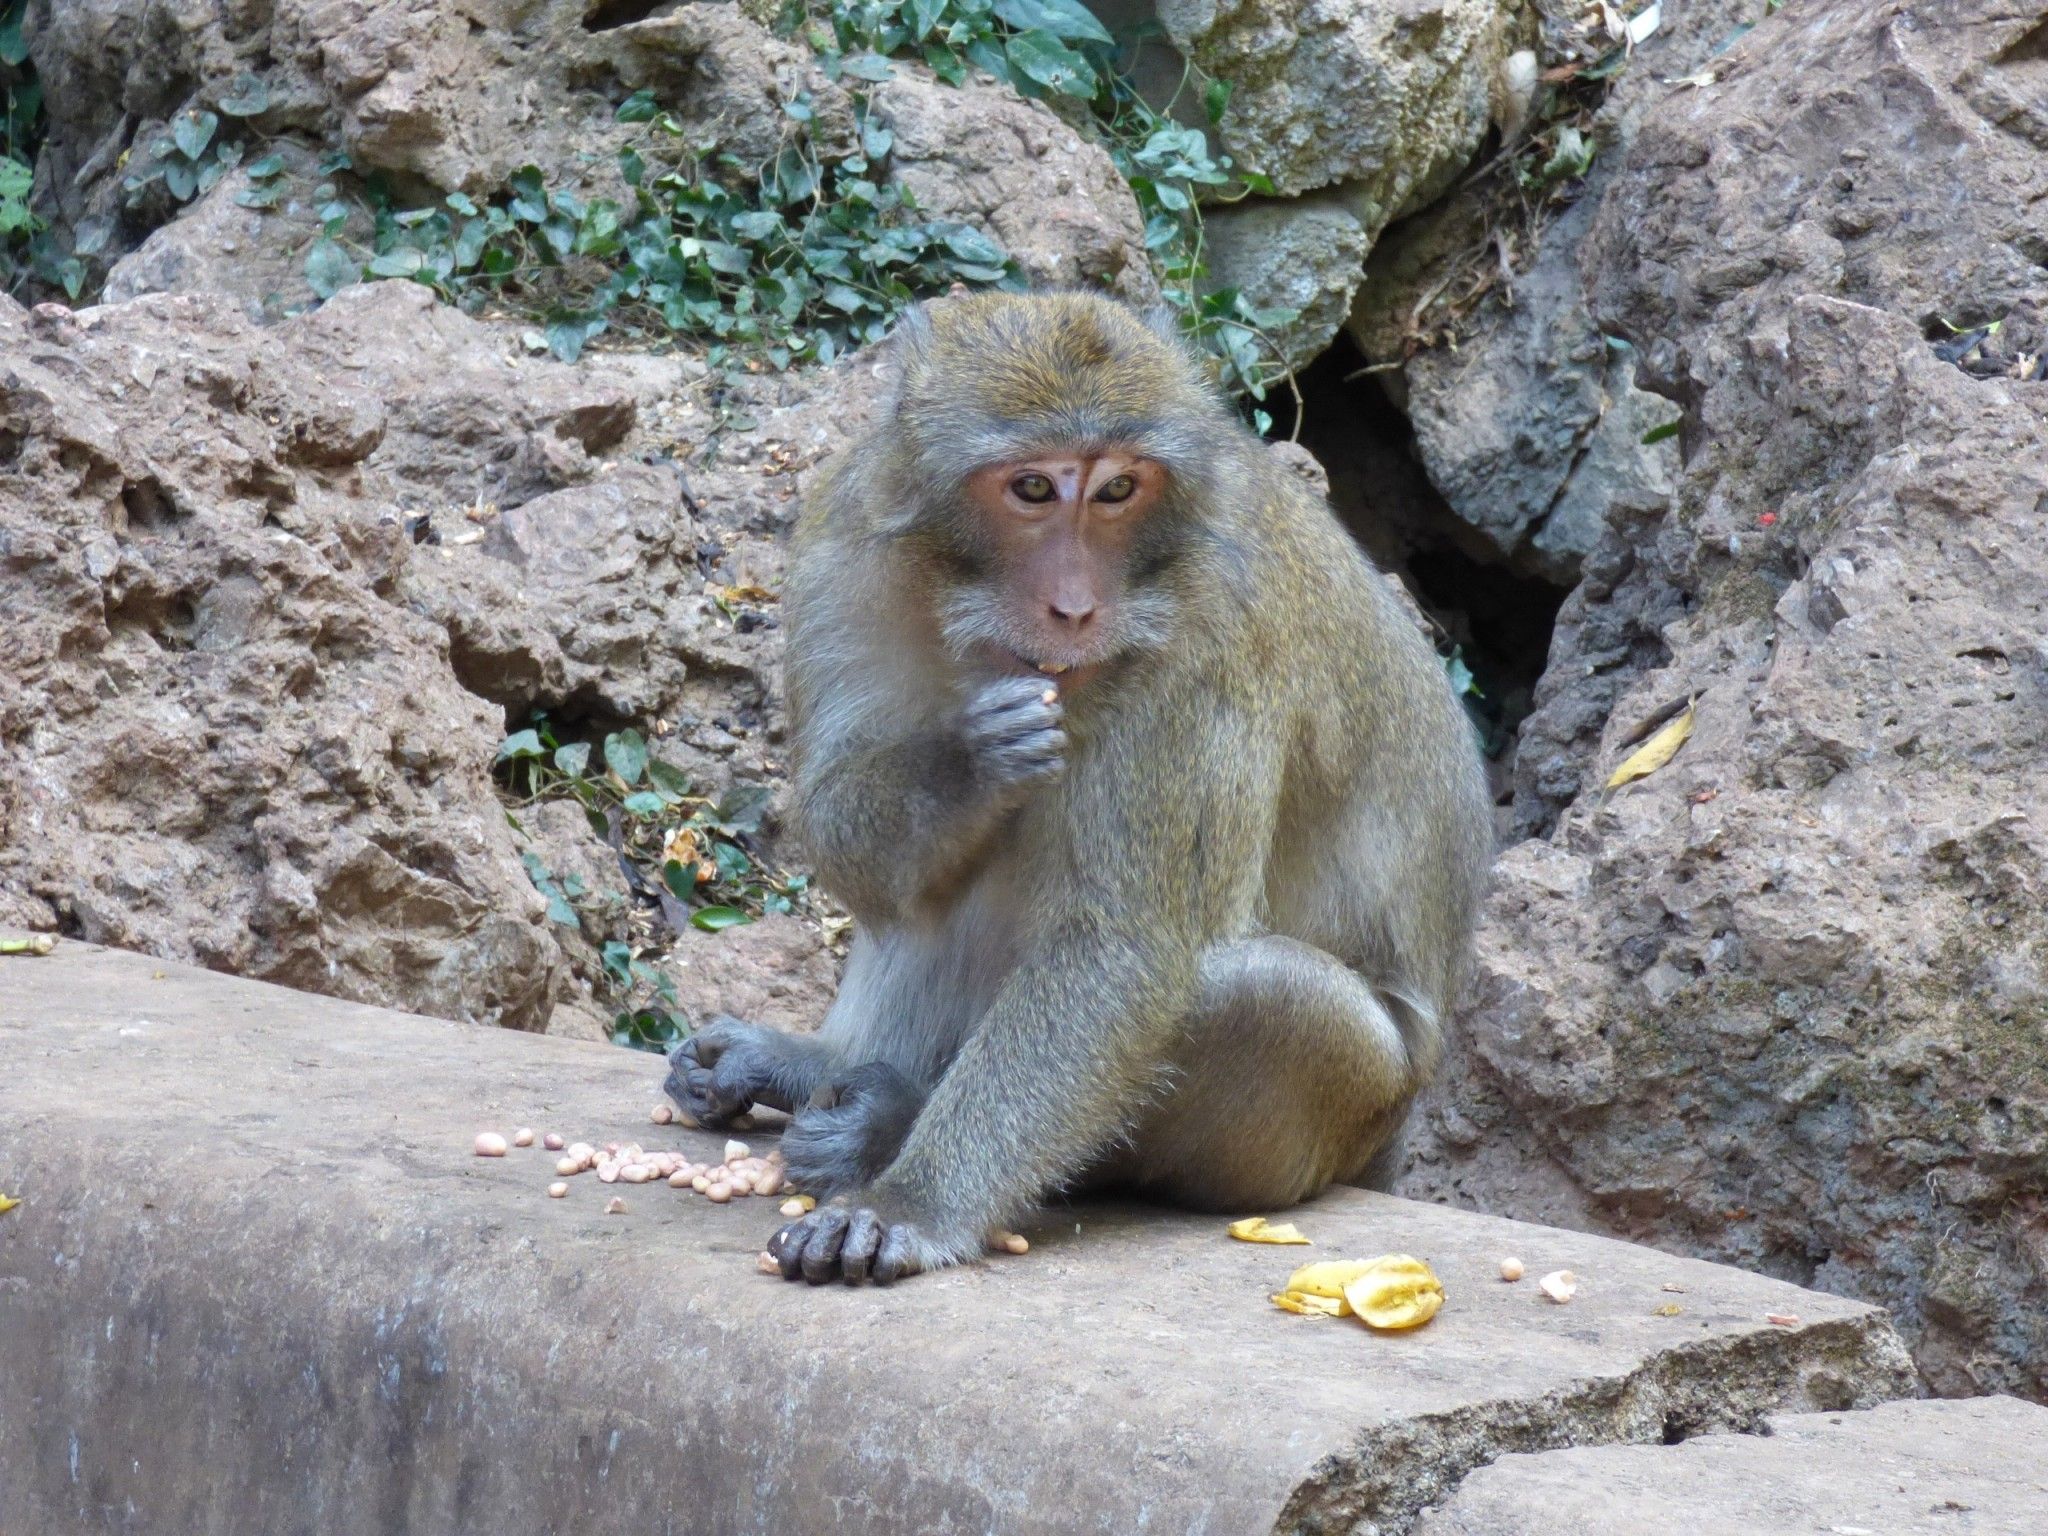 Apina phuket